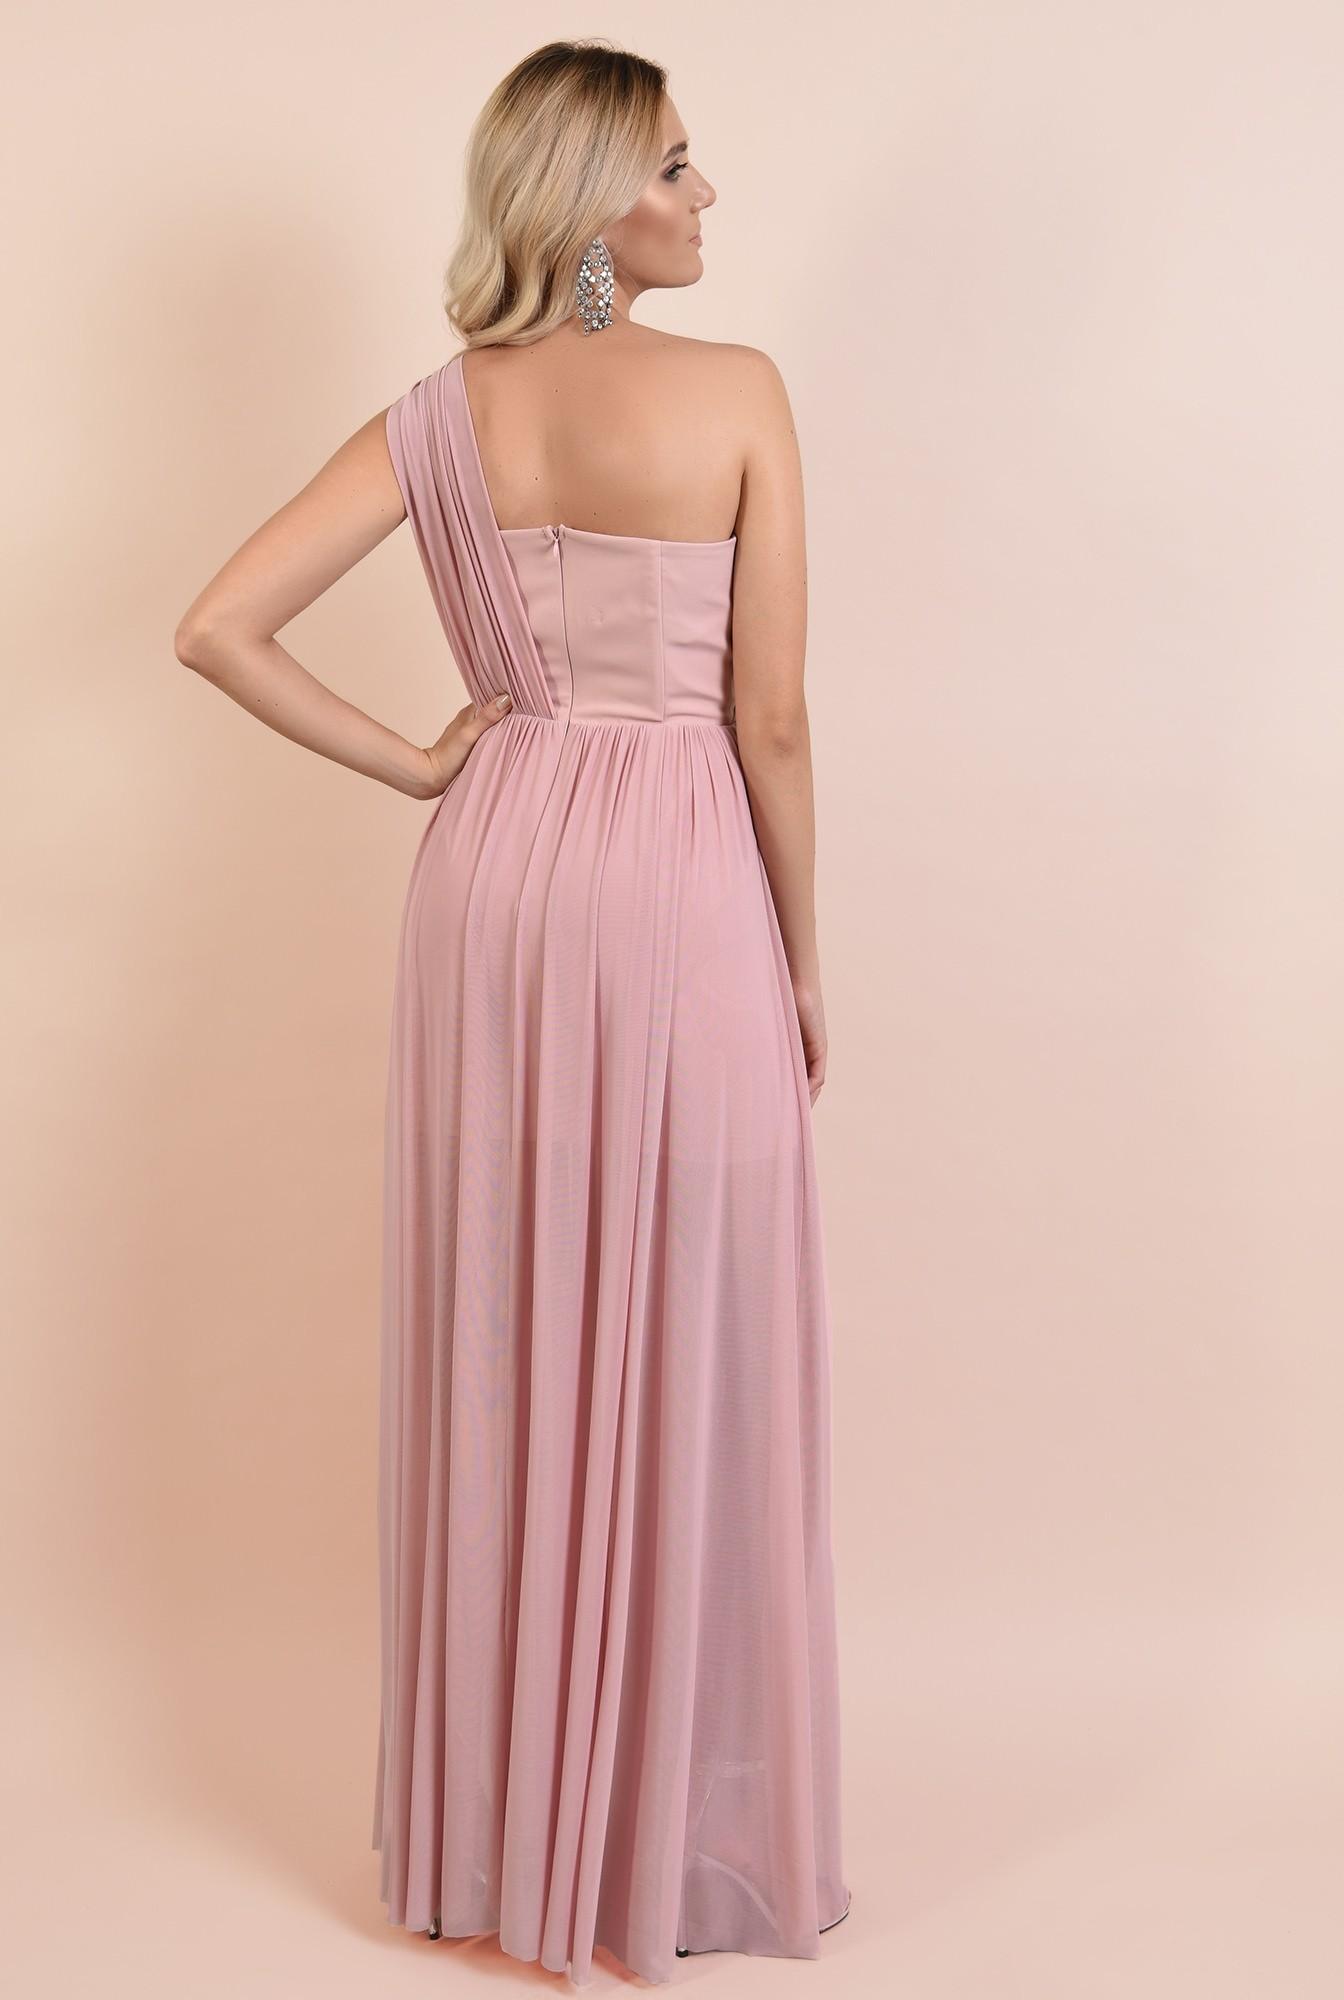 1 - rochie Poema, lunga, evazata, din tul, umar gol, fusta transparenta